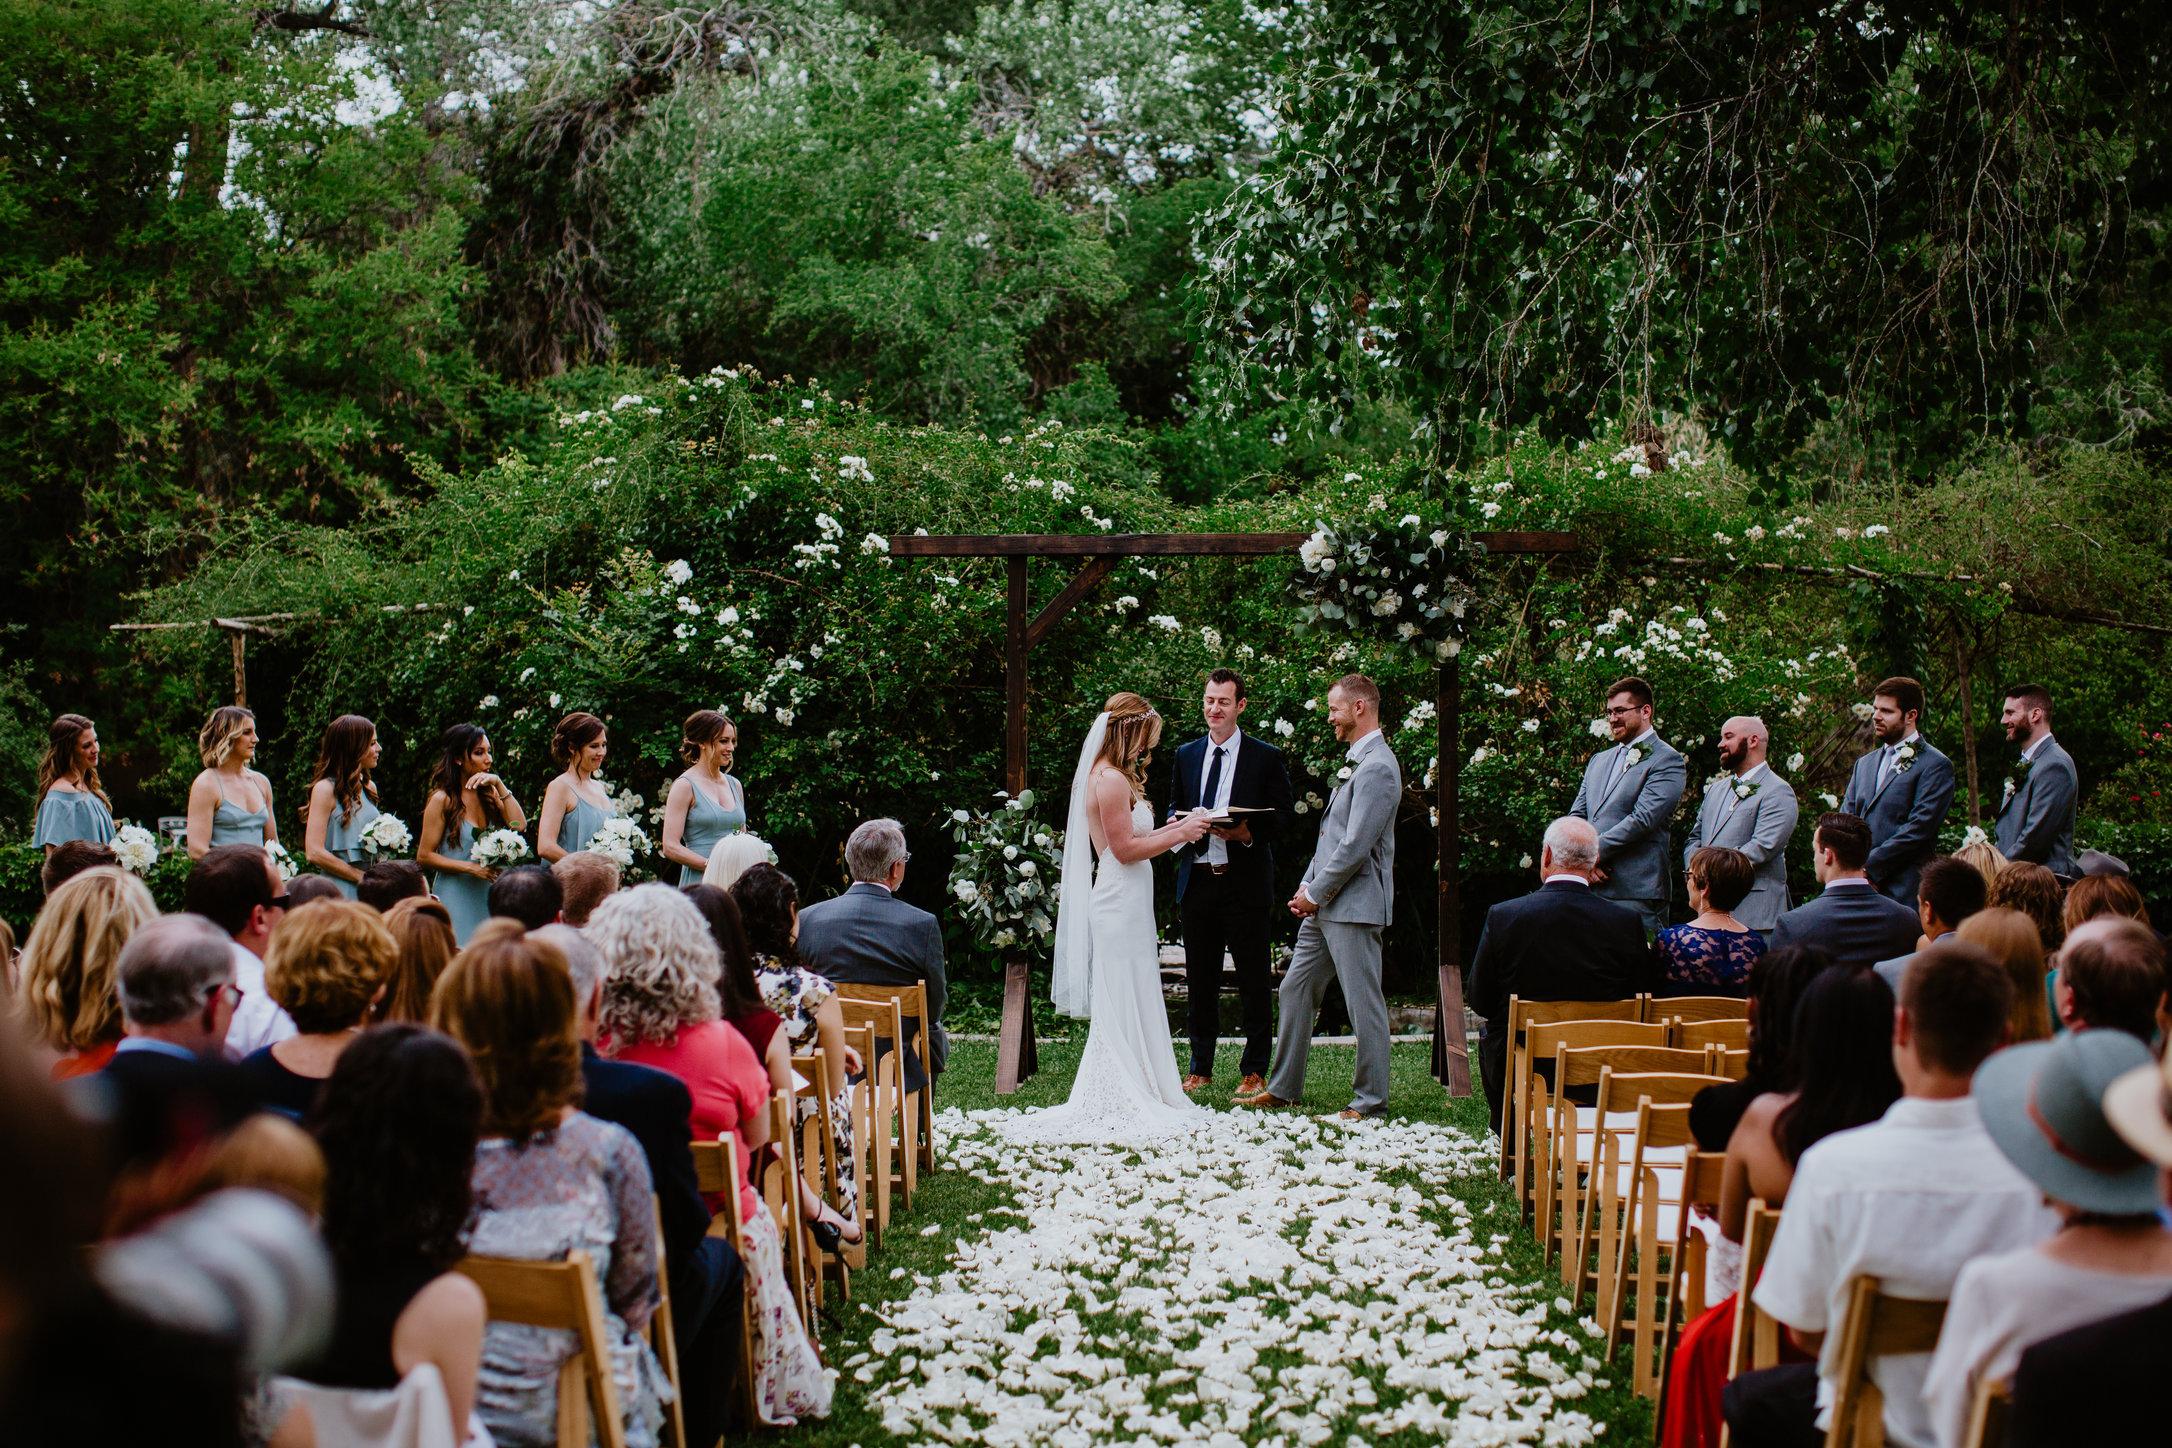 DandA-wedding-278.jpg